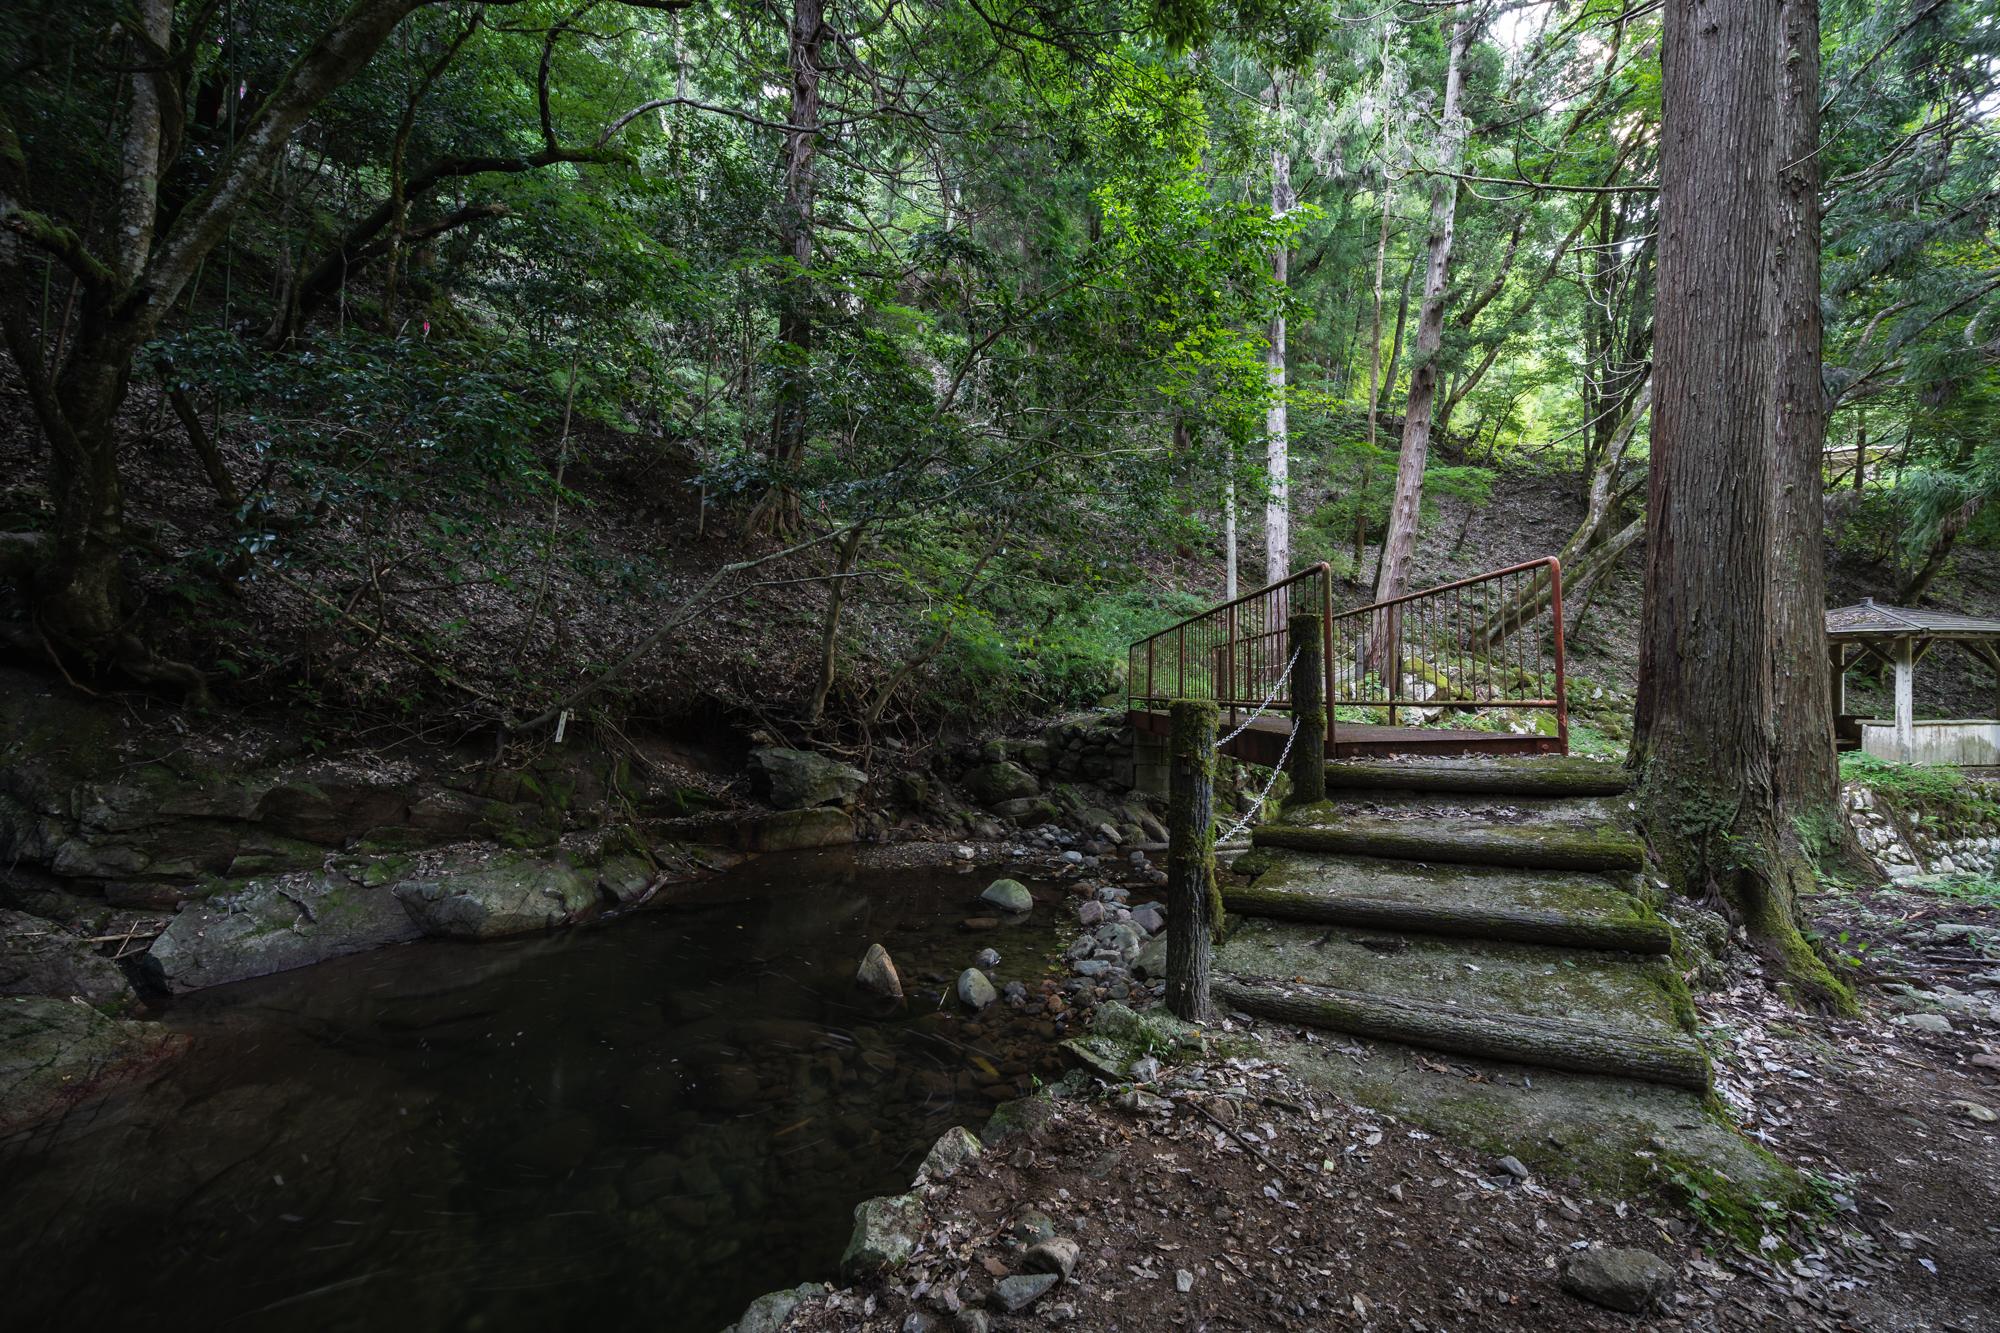 DSC01639 兵庫県   清竜の滝 ( 駐車場から歩いて5分! 関西・近畿・兵庫県の滝スポット! アクセス情報や撮影ポイントなど!)